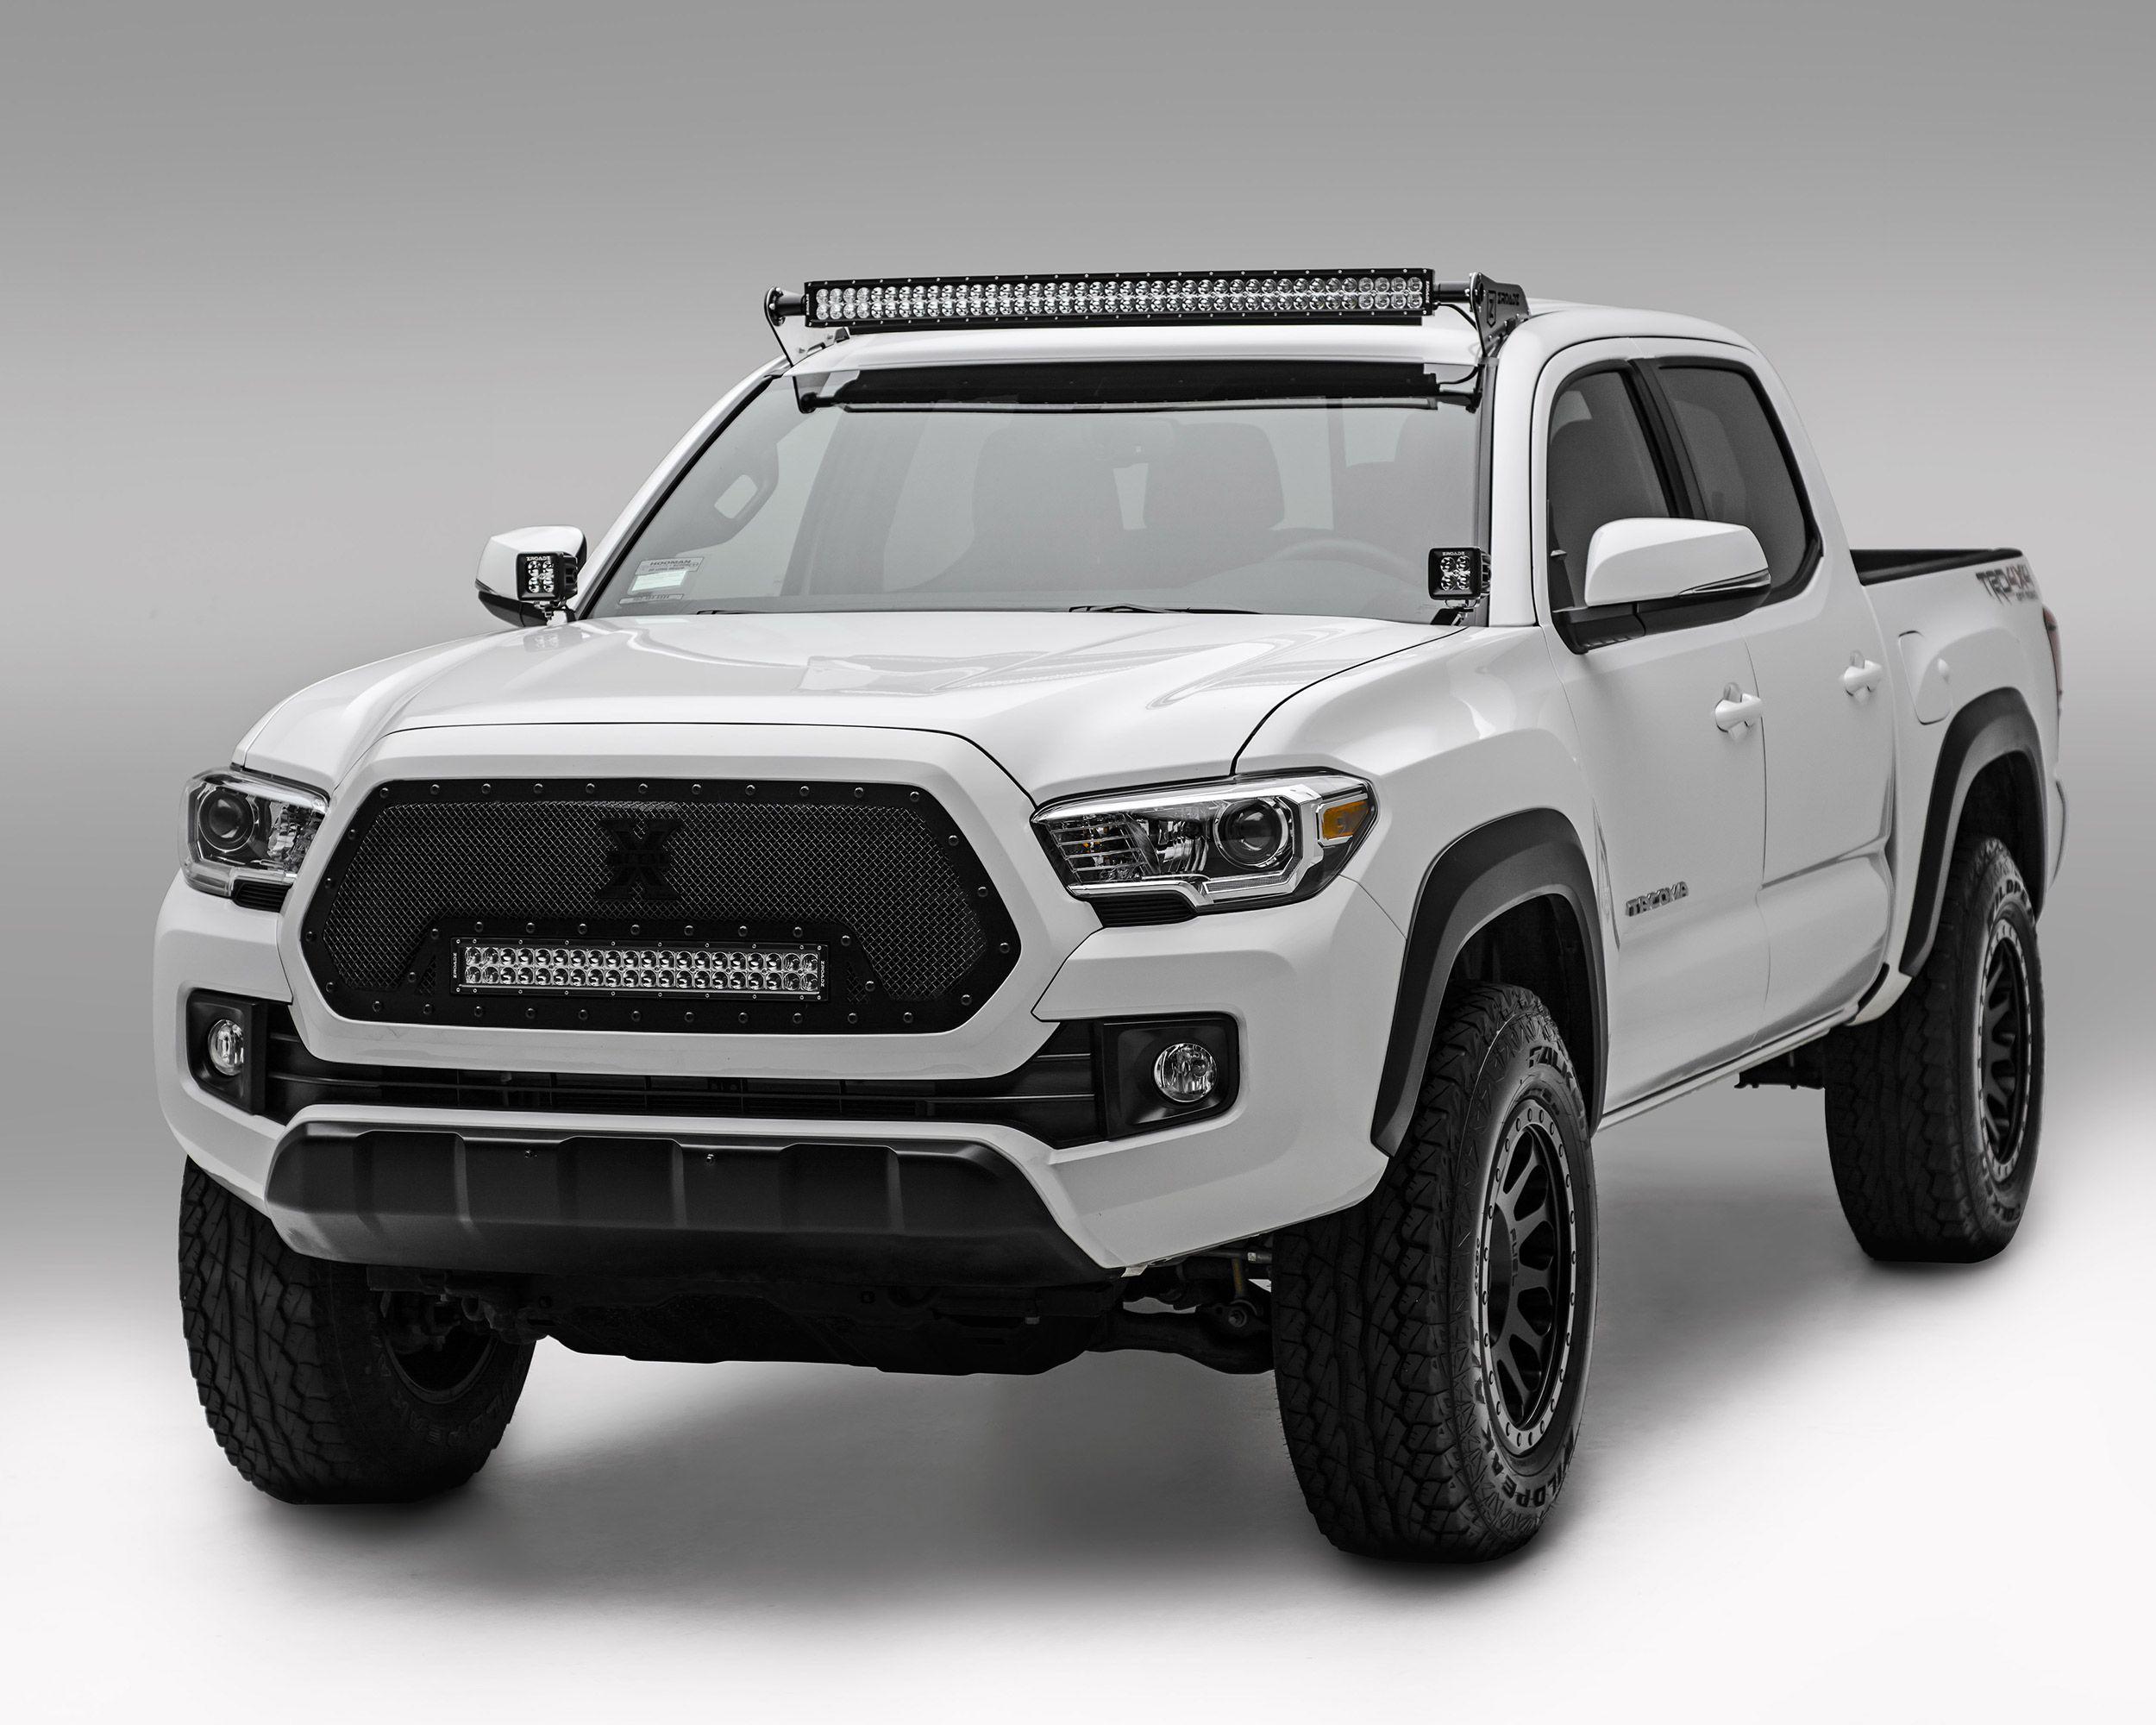 Toyota tacoma 2015 google search 2015 toyota trucks pinterest toyota tacoma 2015 toyota tacoma and toyota